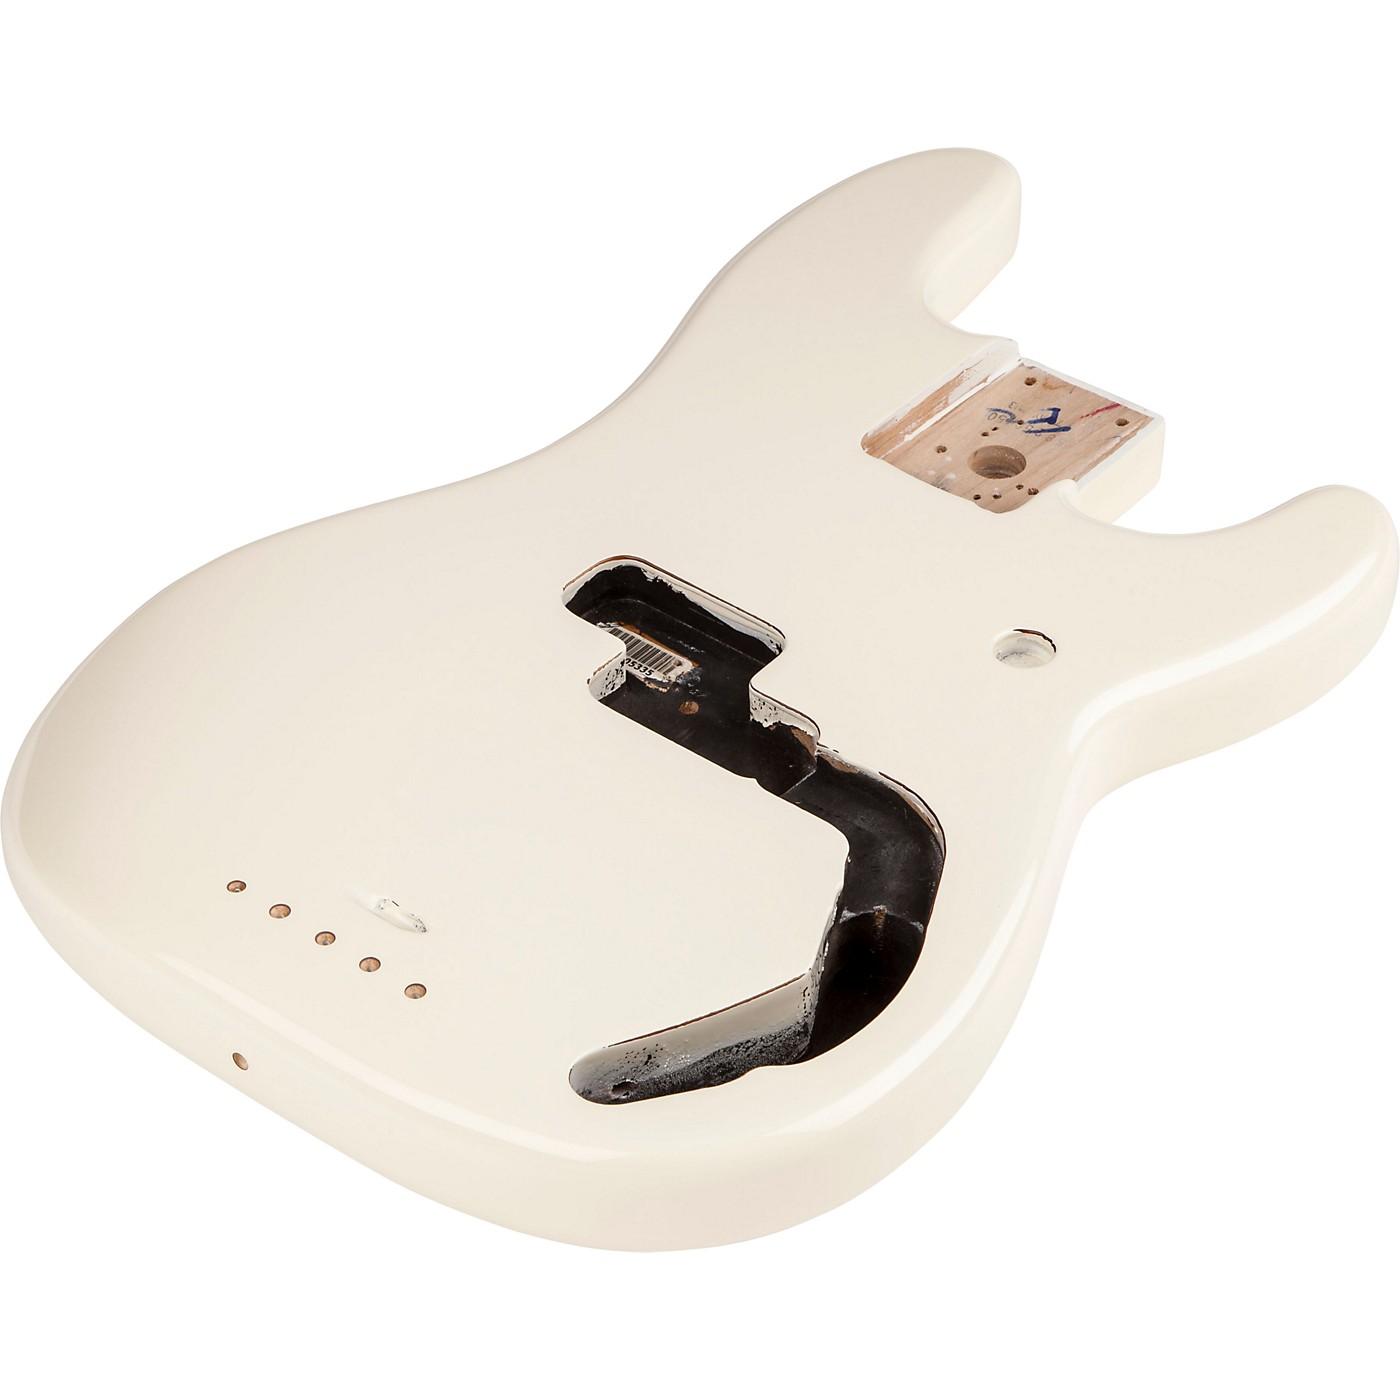 Fender Precision Bass Alder Body thumbnail